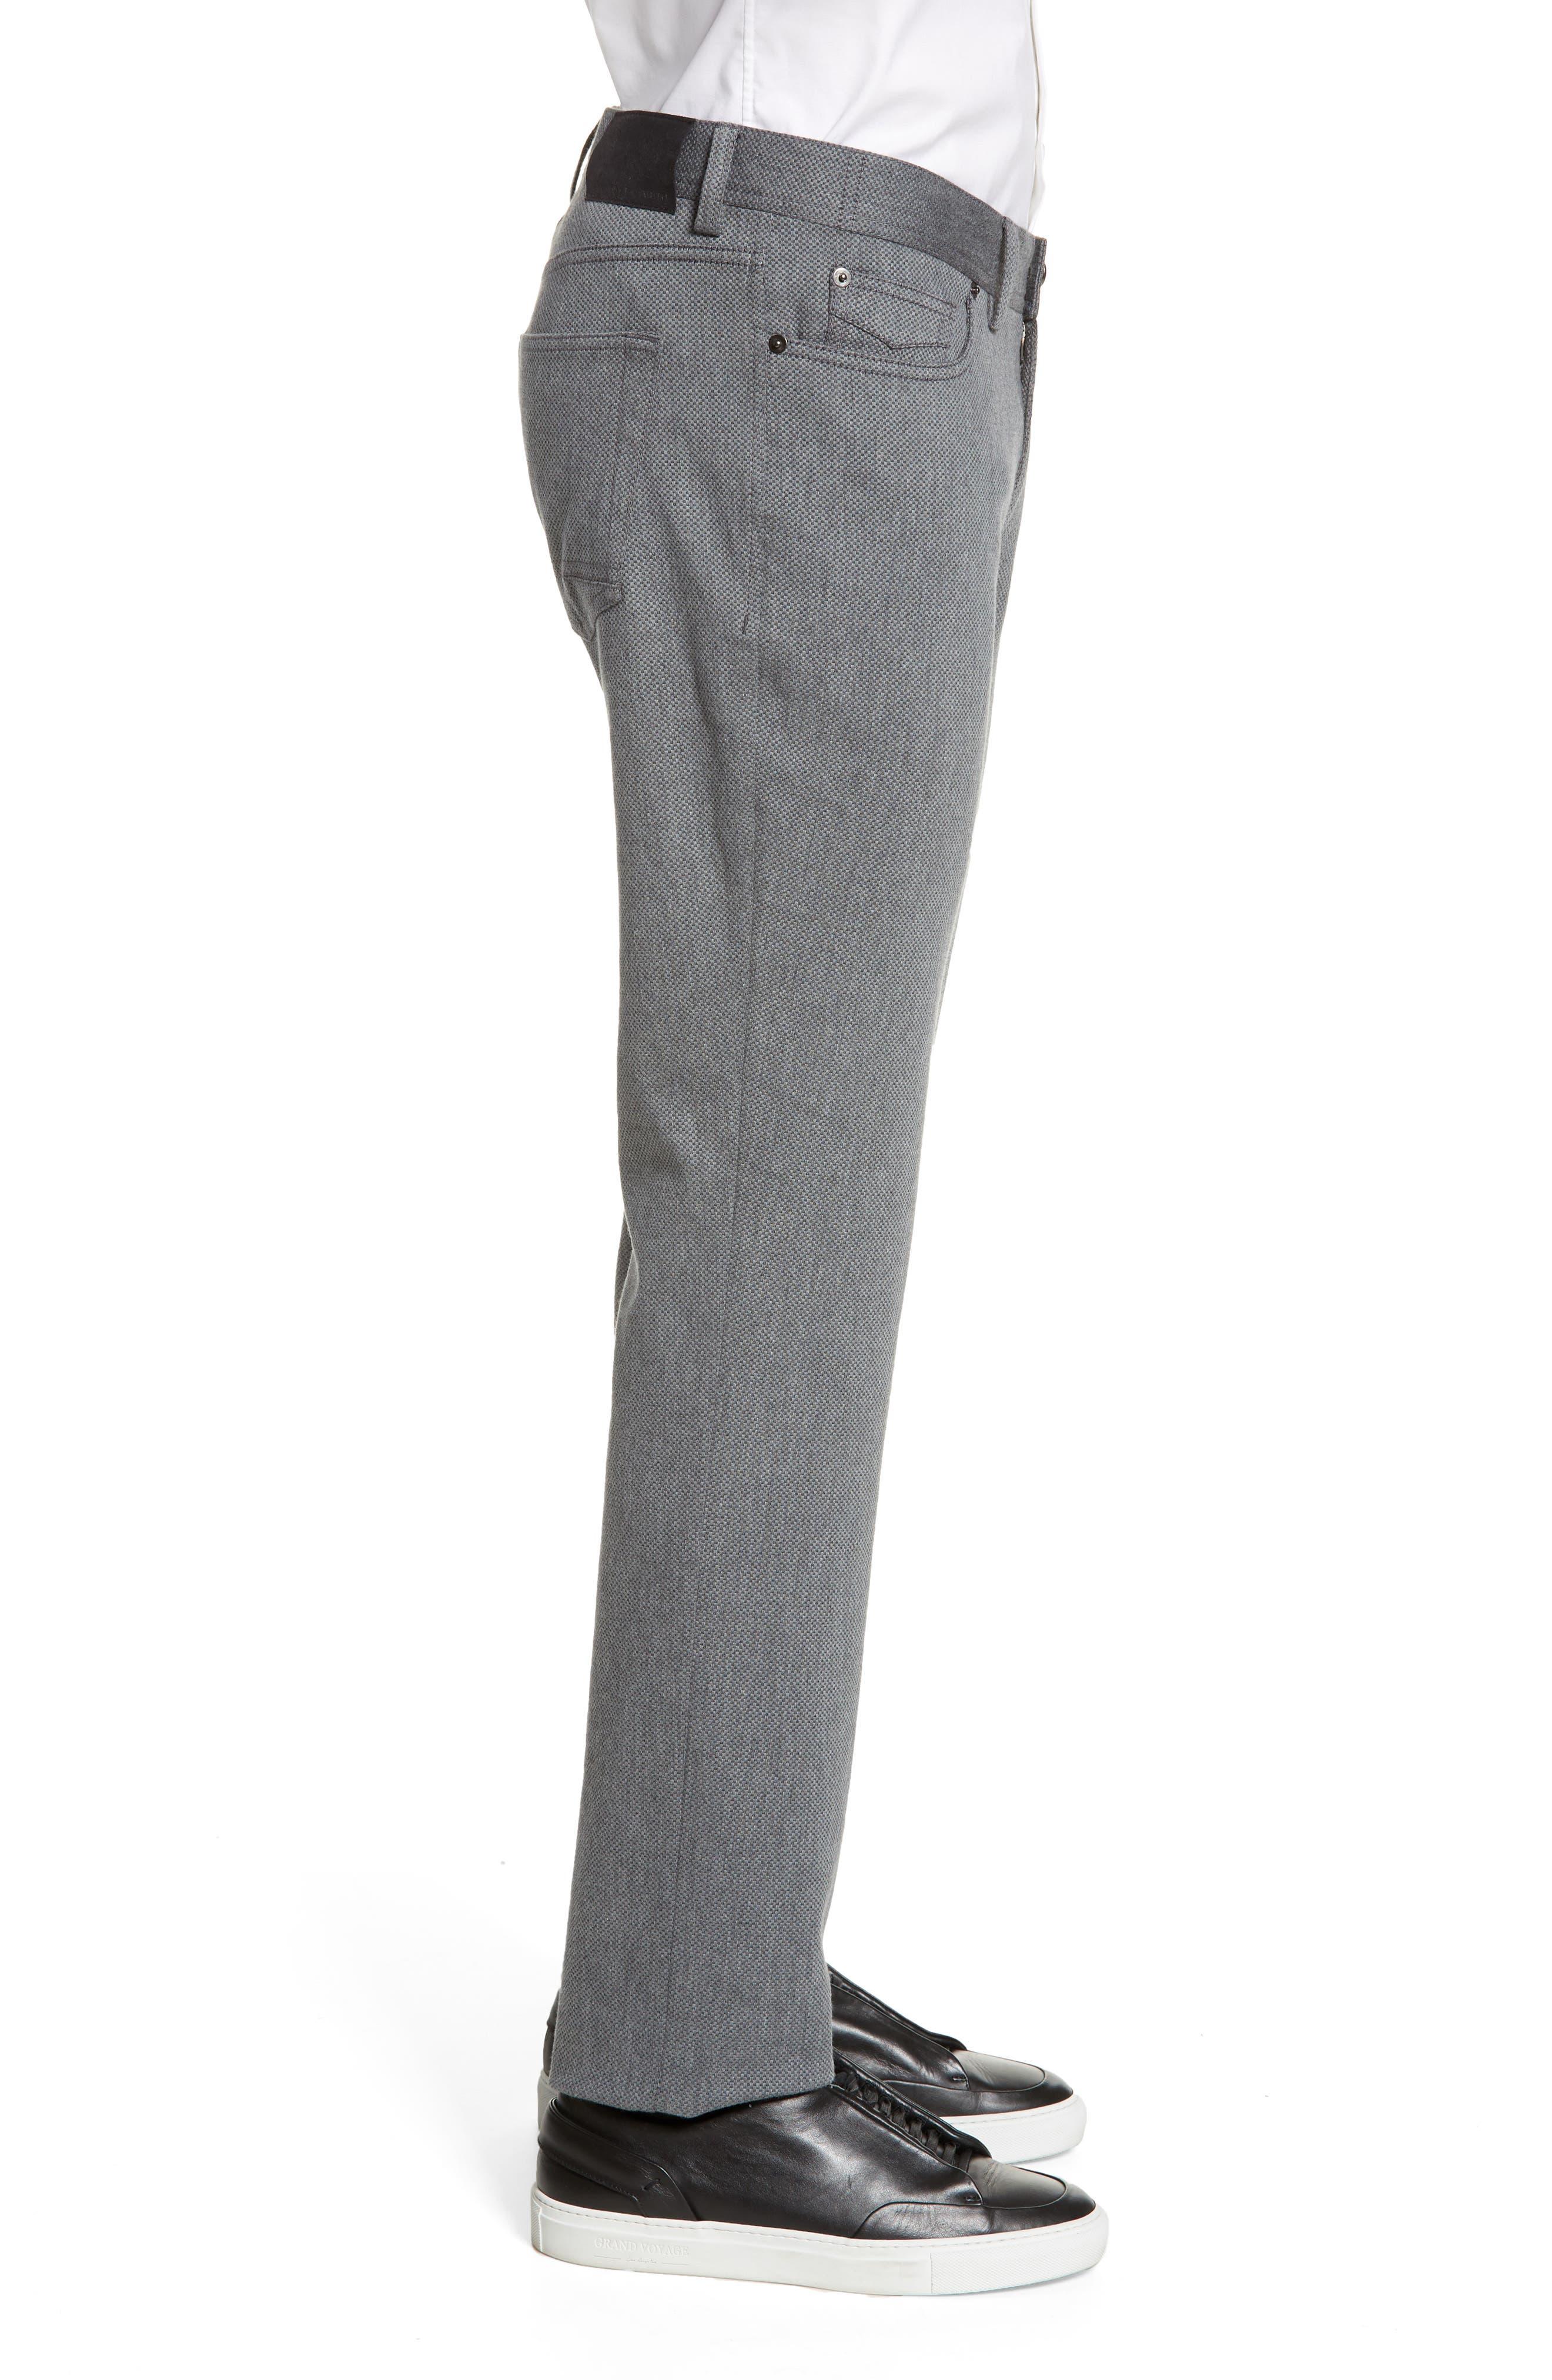 VINCE CAMUTO, Straight Leg Five Pocket Stretch Pants, Alternate thumbnail 3, color, HEATHER CHARCOAL CROSSHATCH